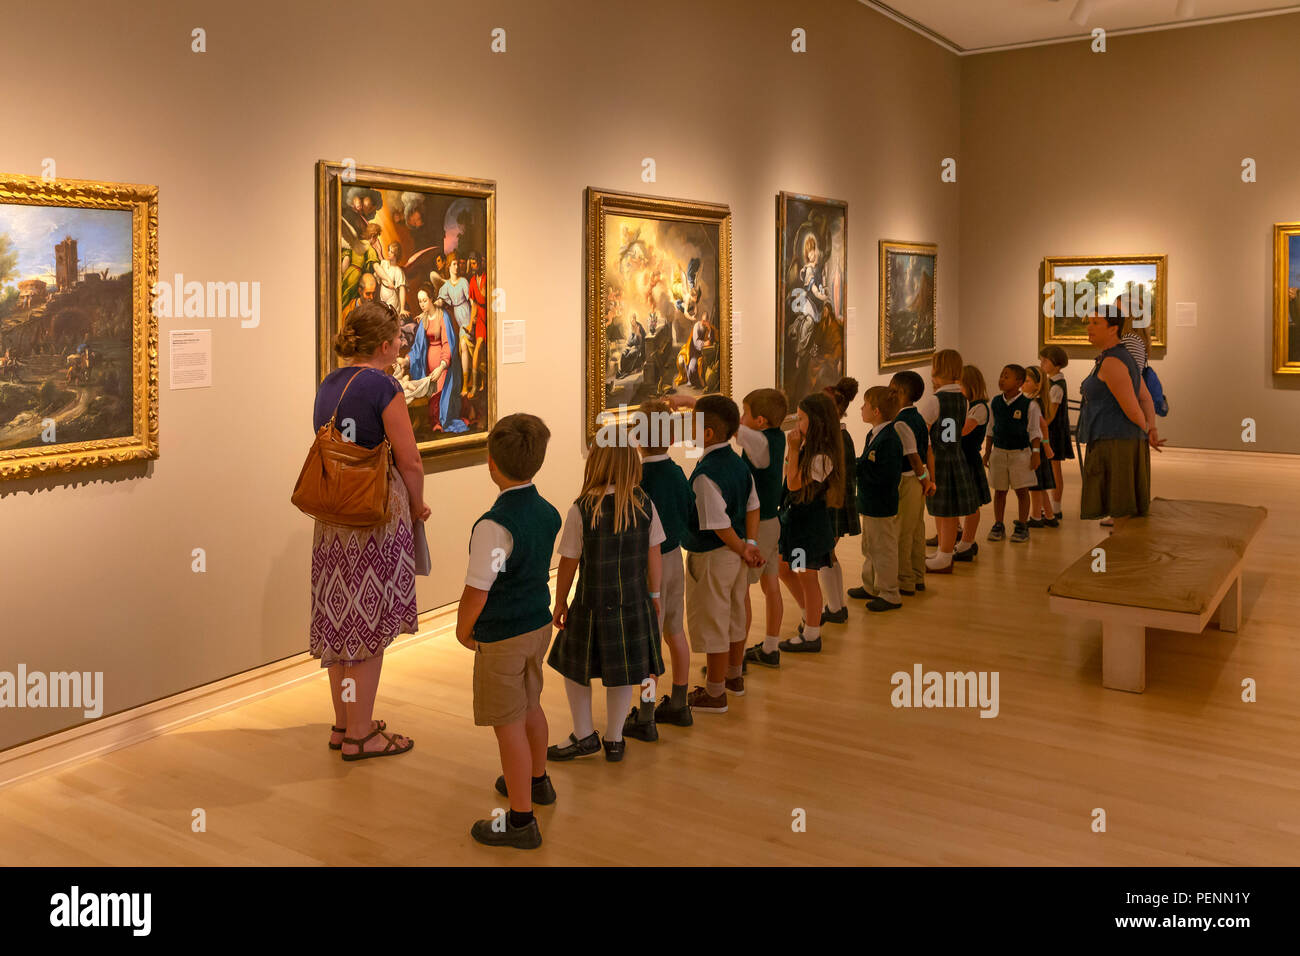 School children learning about fine art, Indianapolis Museum of Art, Indianapolis, Indiana, USA, North America - Stock Image